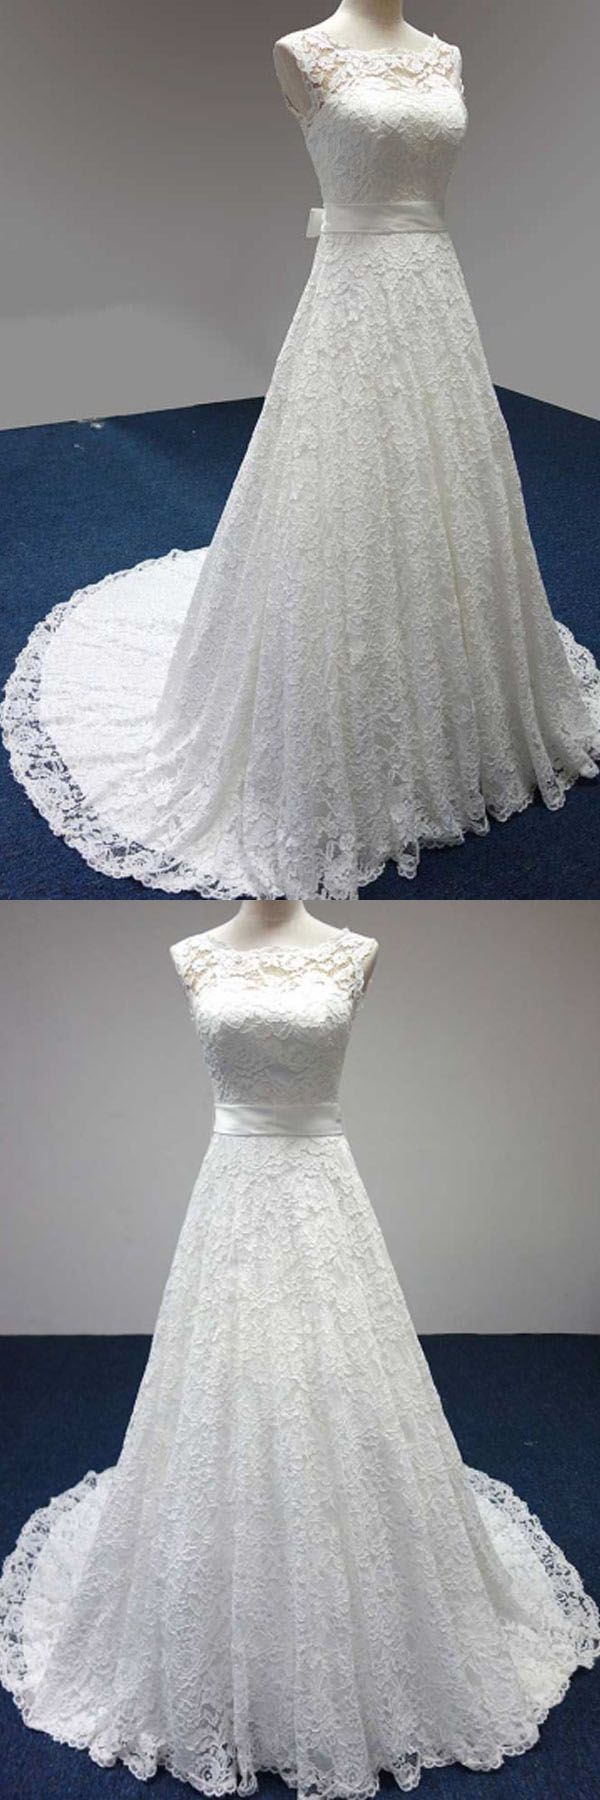 Bateau A-Line Lace Sash Bowknot Sleeveless Wedding Dress WD158 #weddingdress #dreamwedding #bridalgown